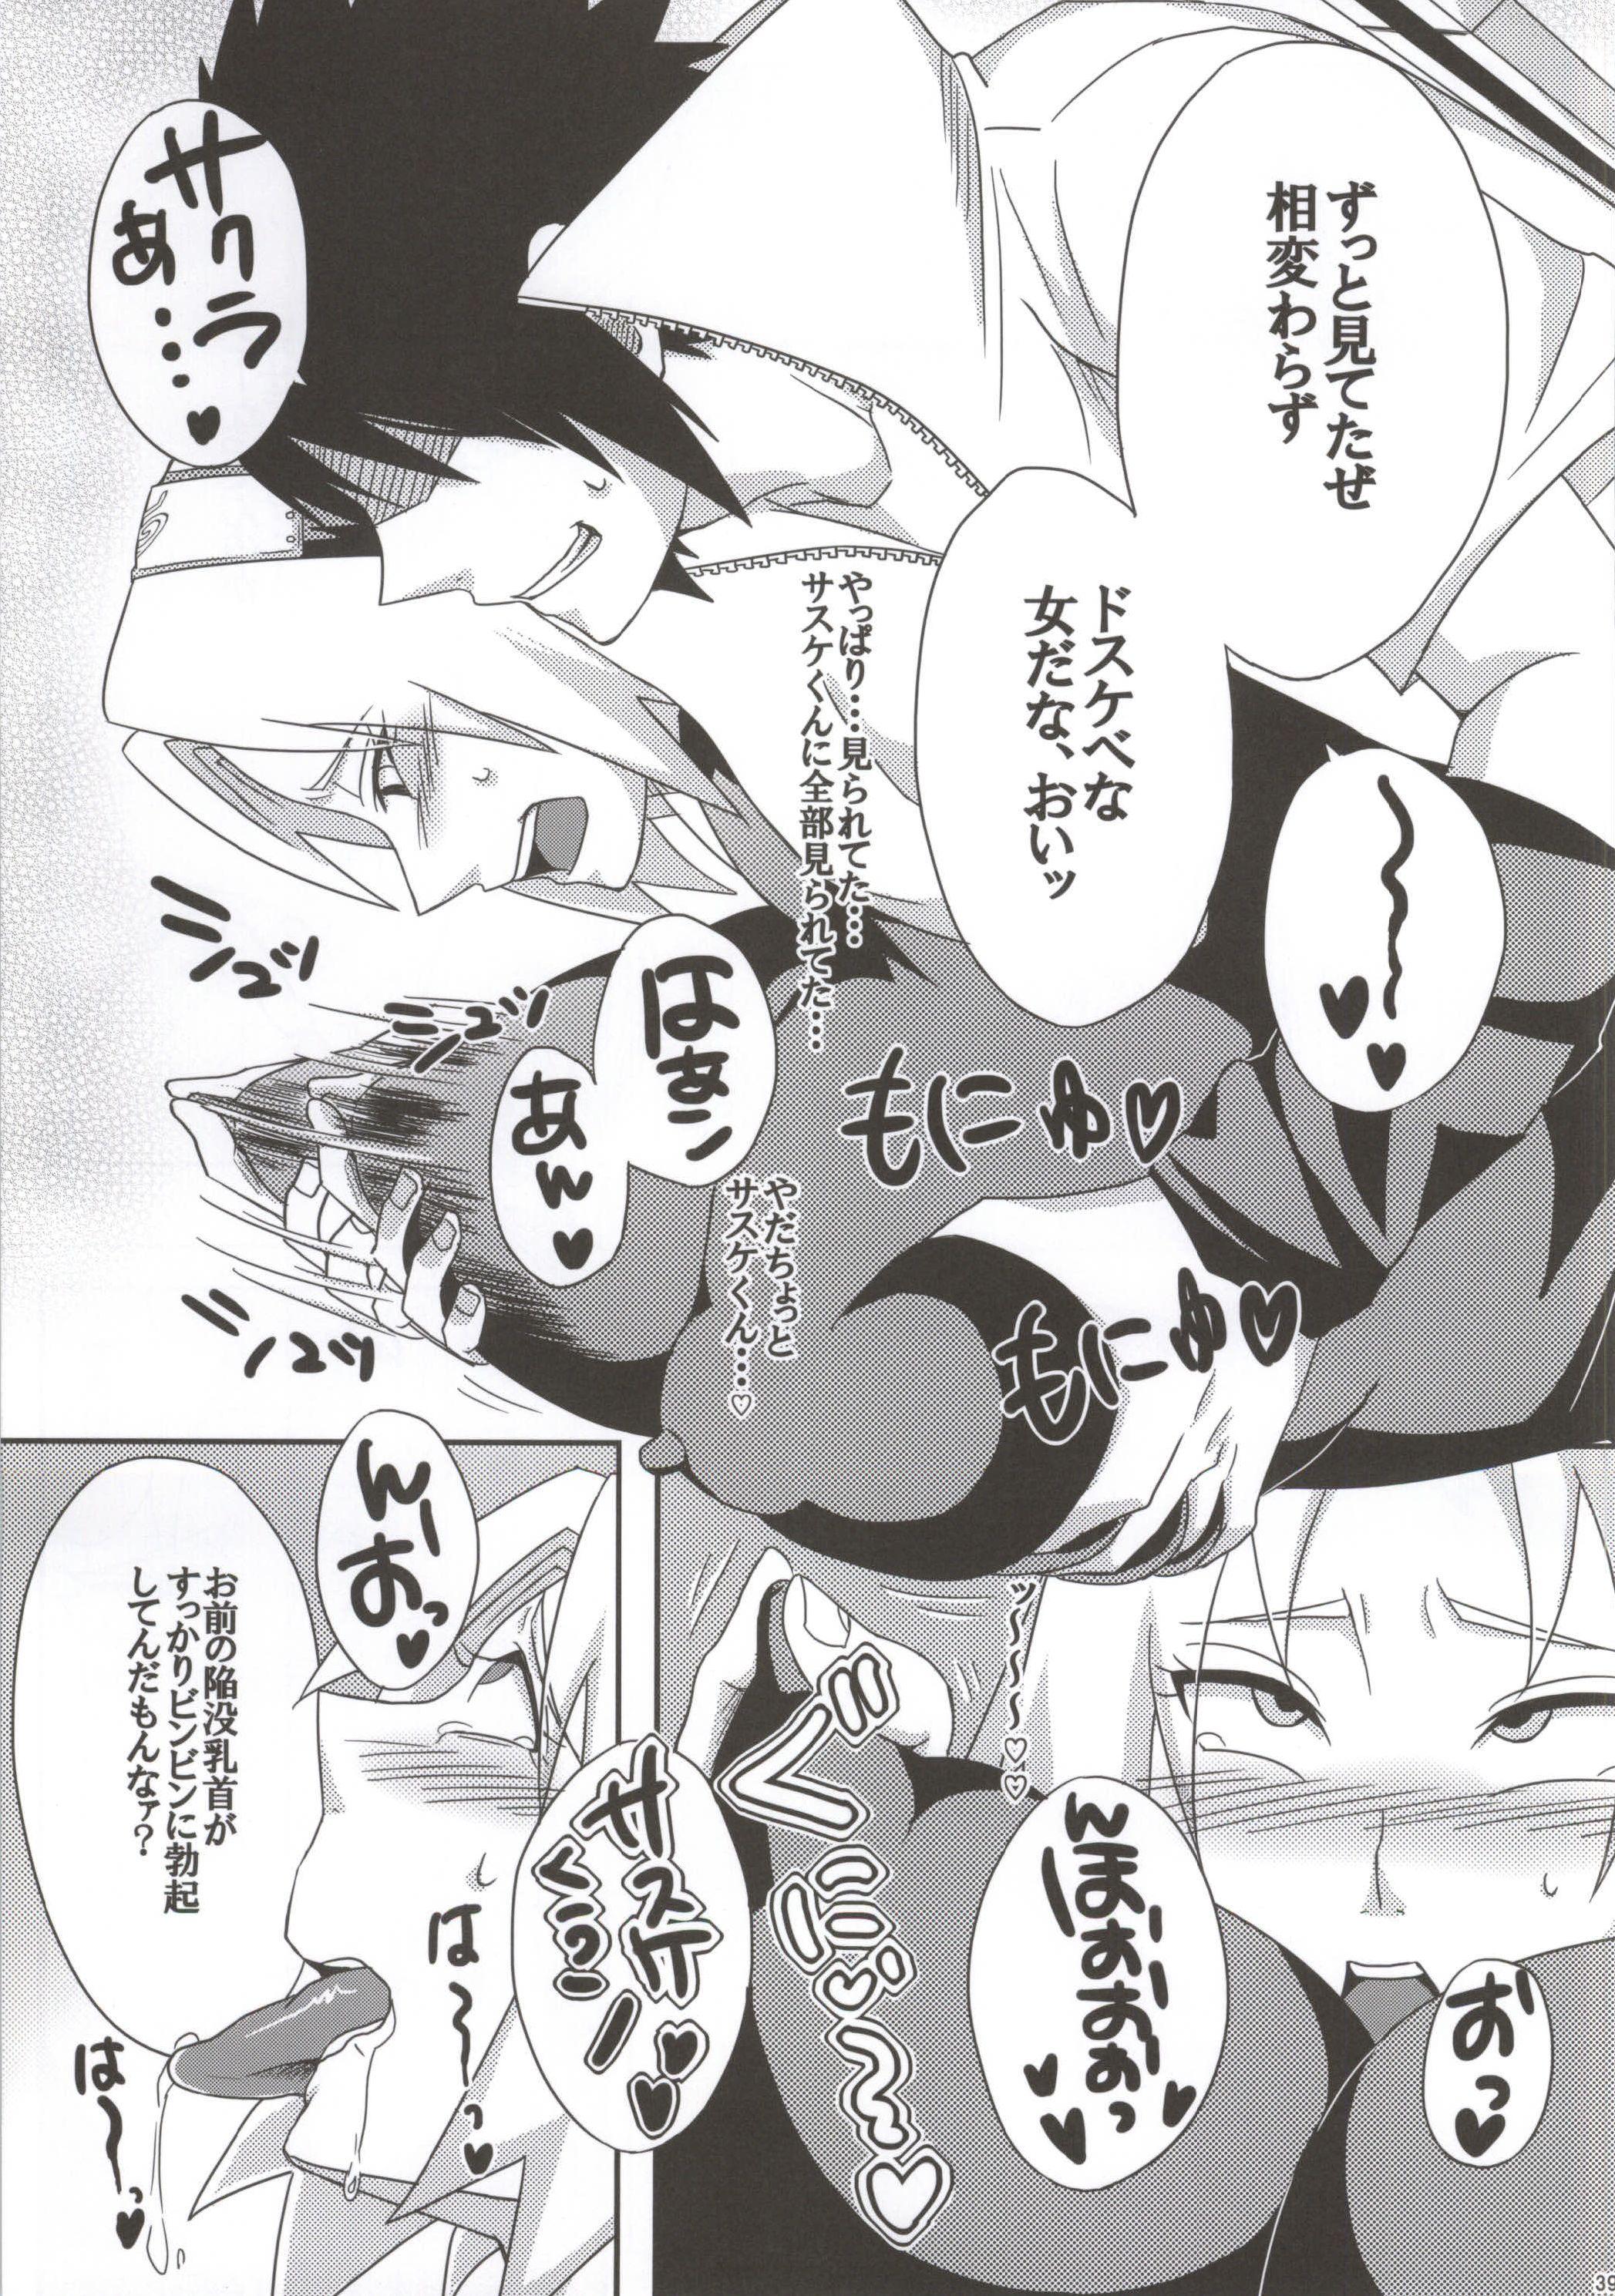 Секс комиксы сакура и саске фото 670-289